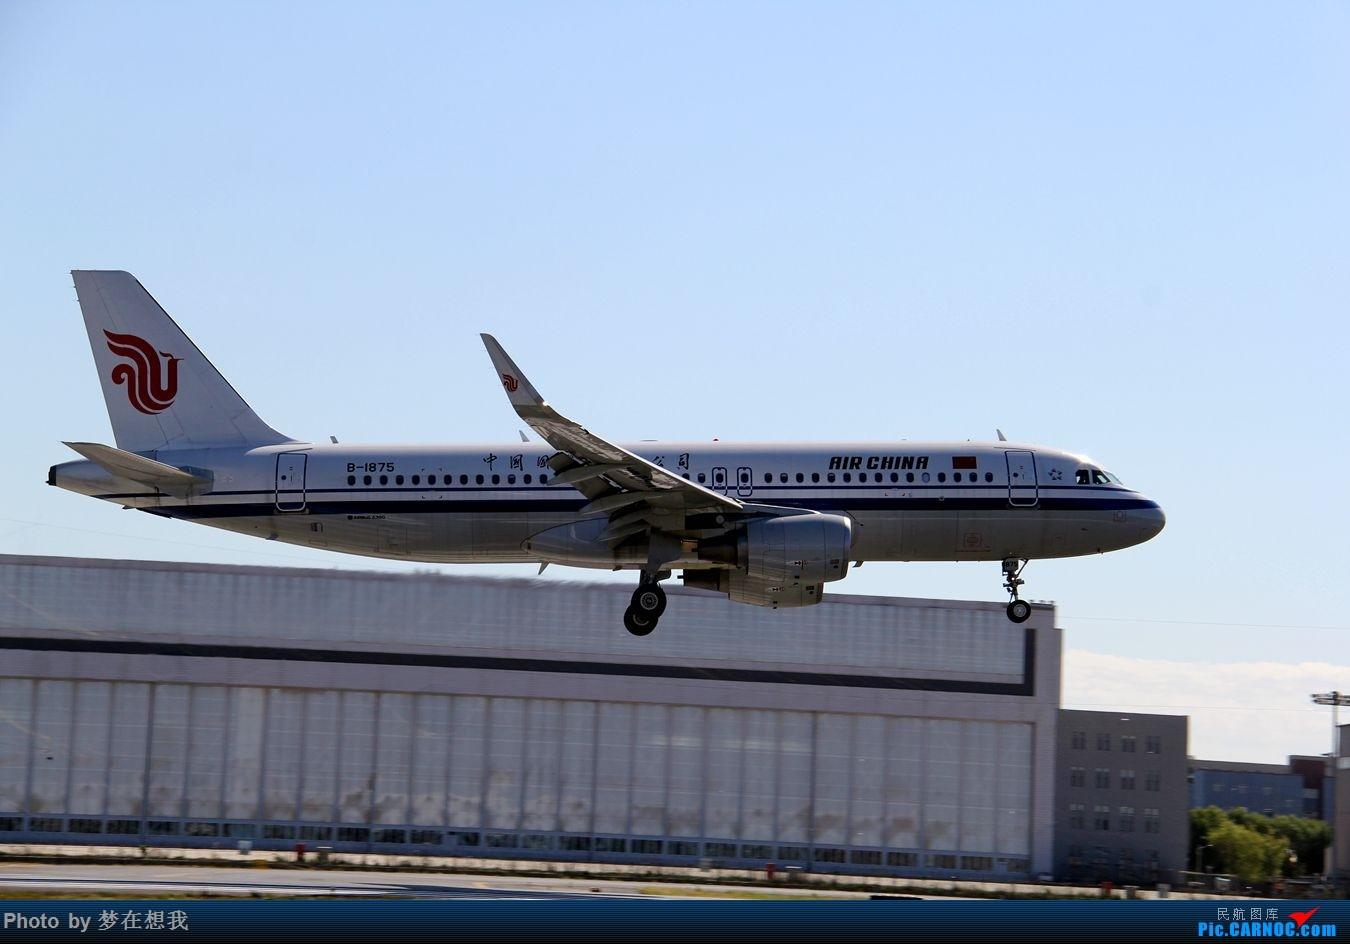 Re:[原创]十月二号高中党坐动车从丹东到沈阳拍机SHE AIRBUS A320-200 B-1875 中国沈阳桃仙国际机场